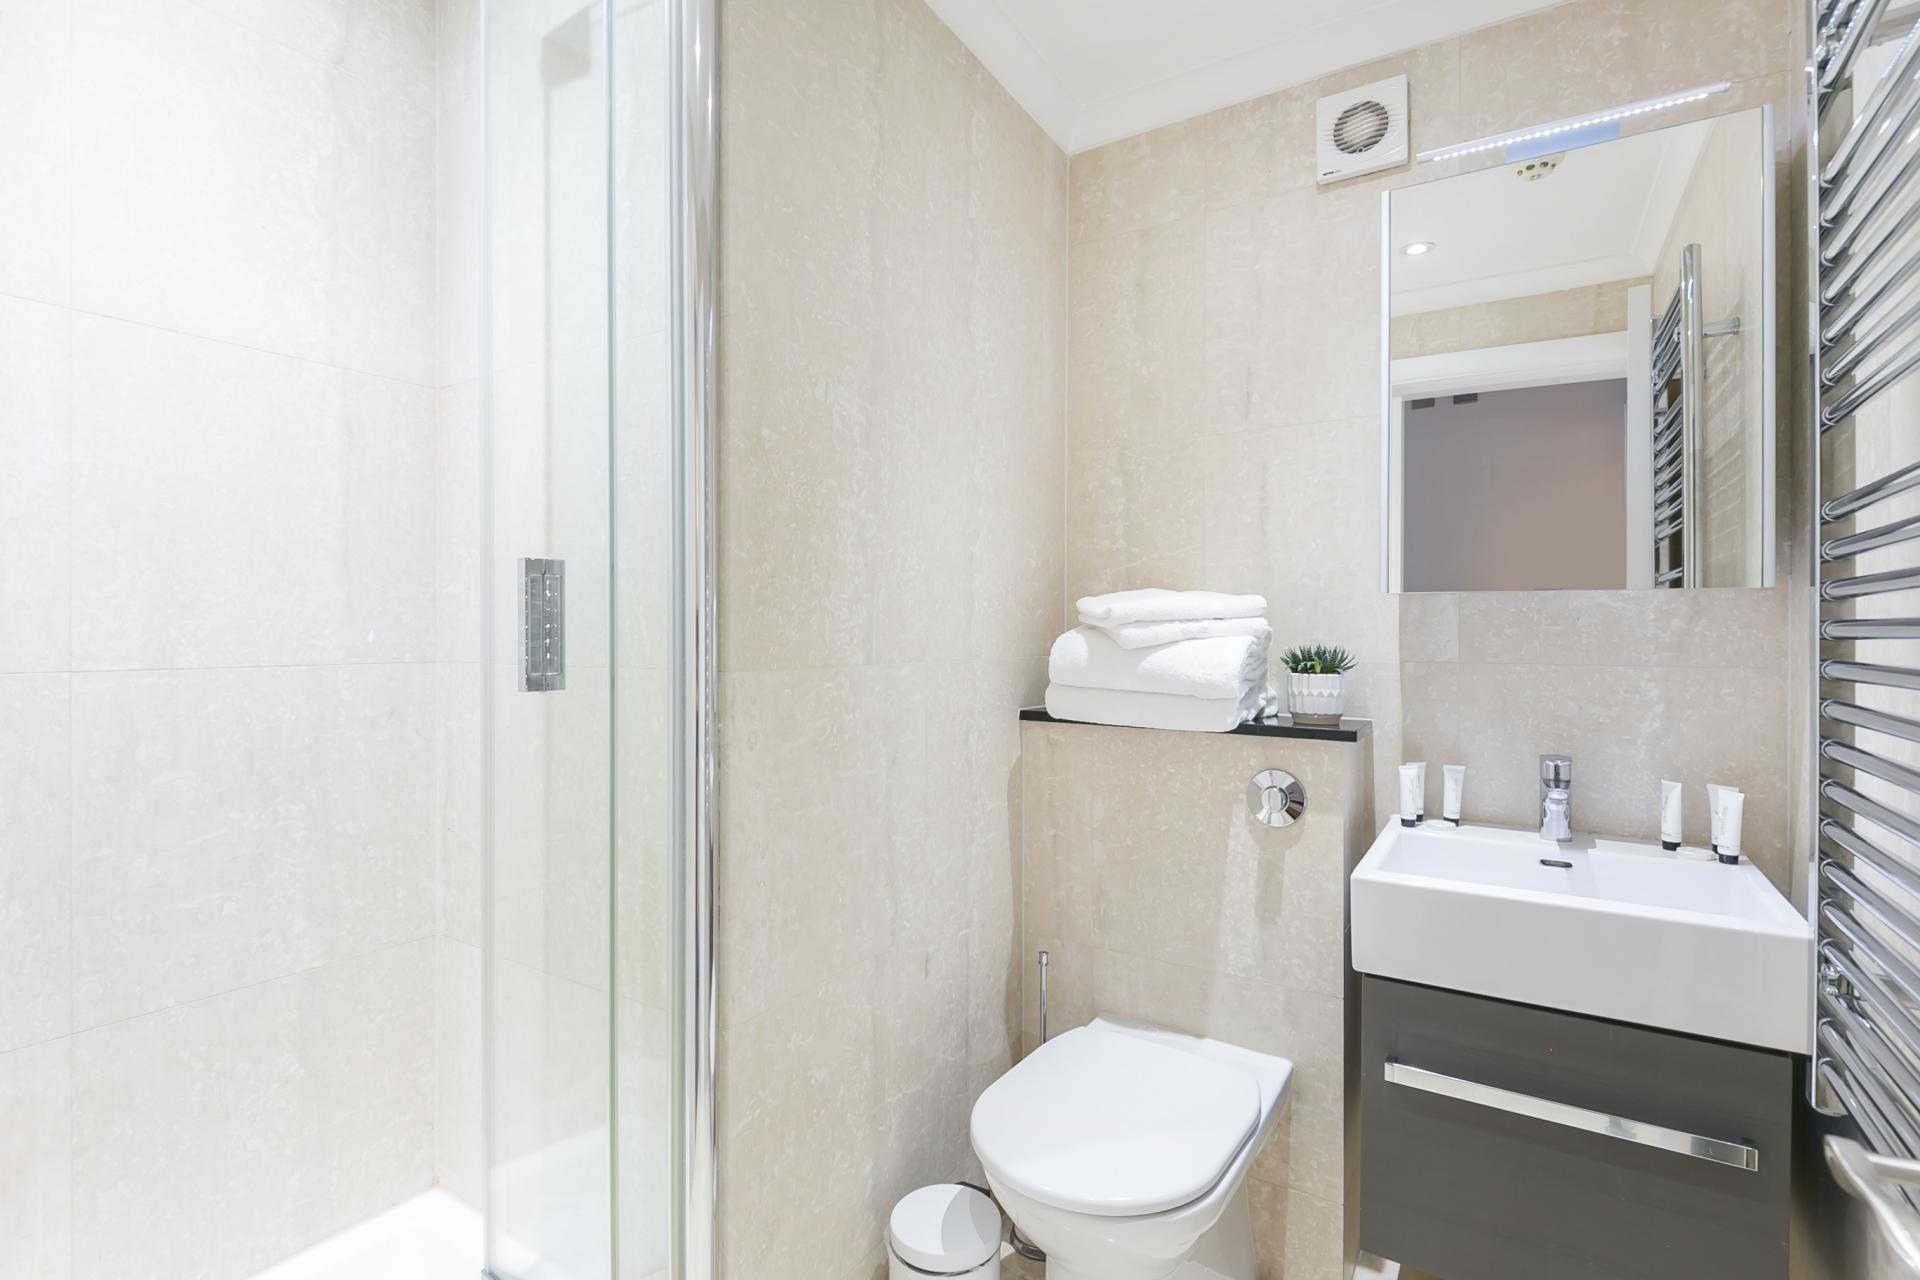 Bathroom at Chilworth Court Serviced Apartments, Paddington, London